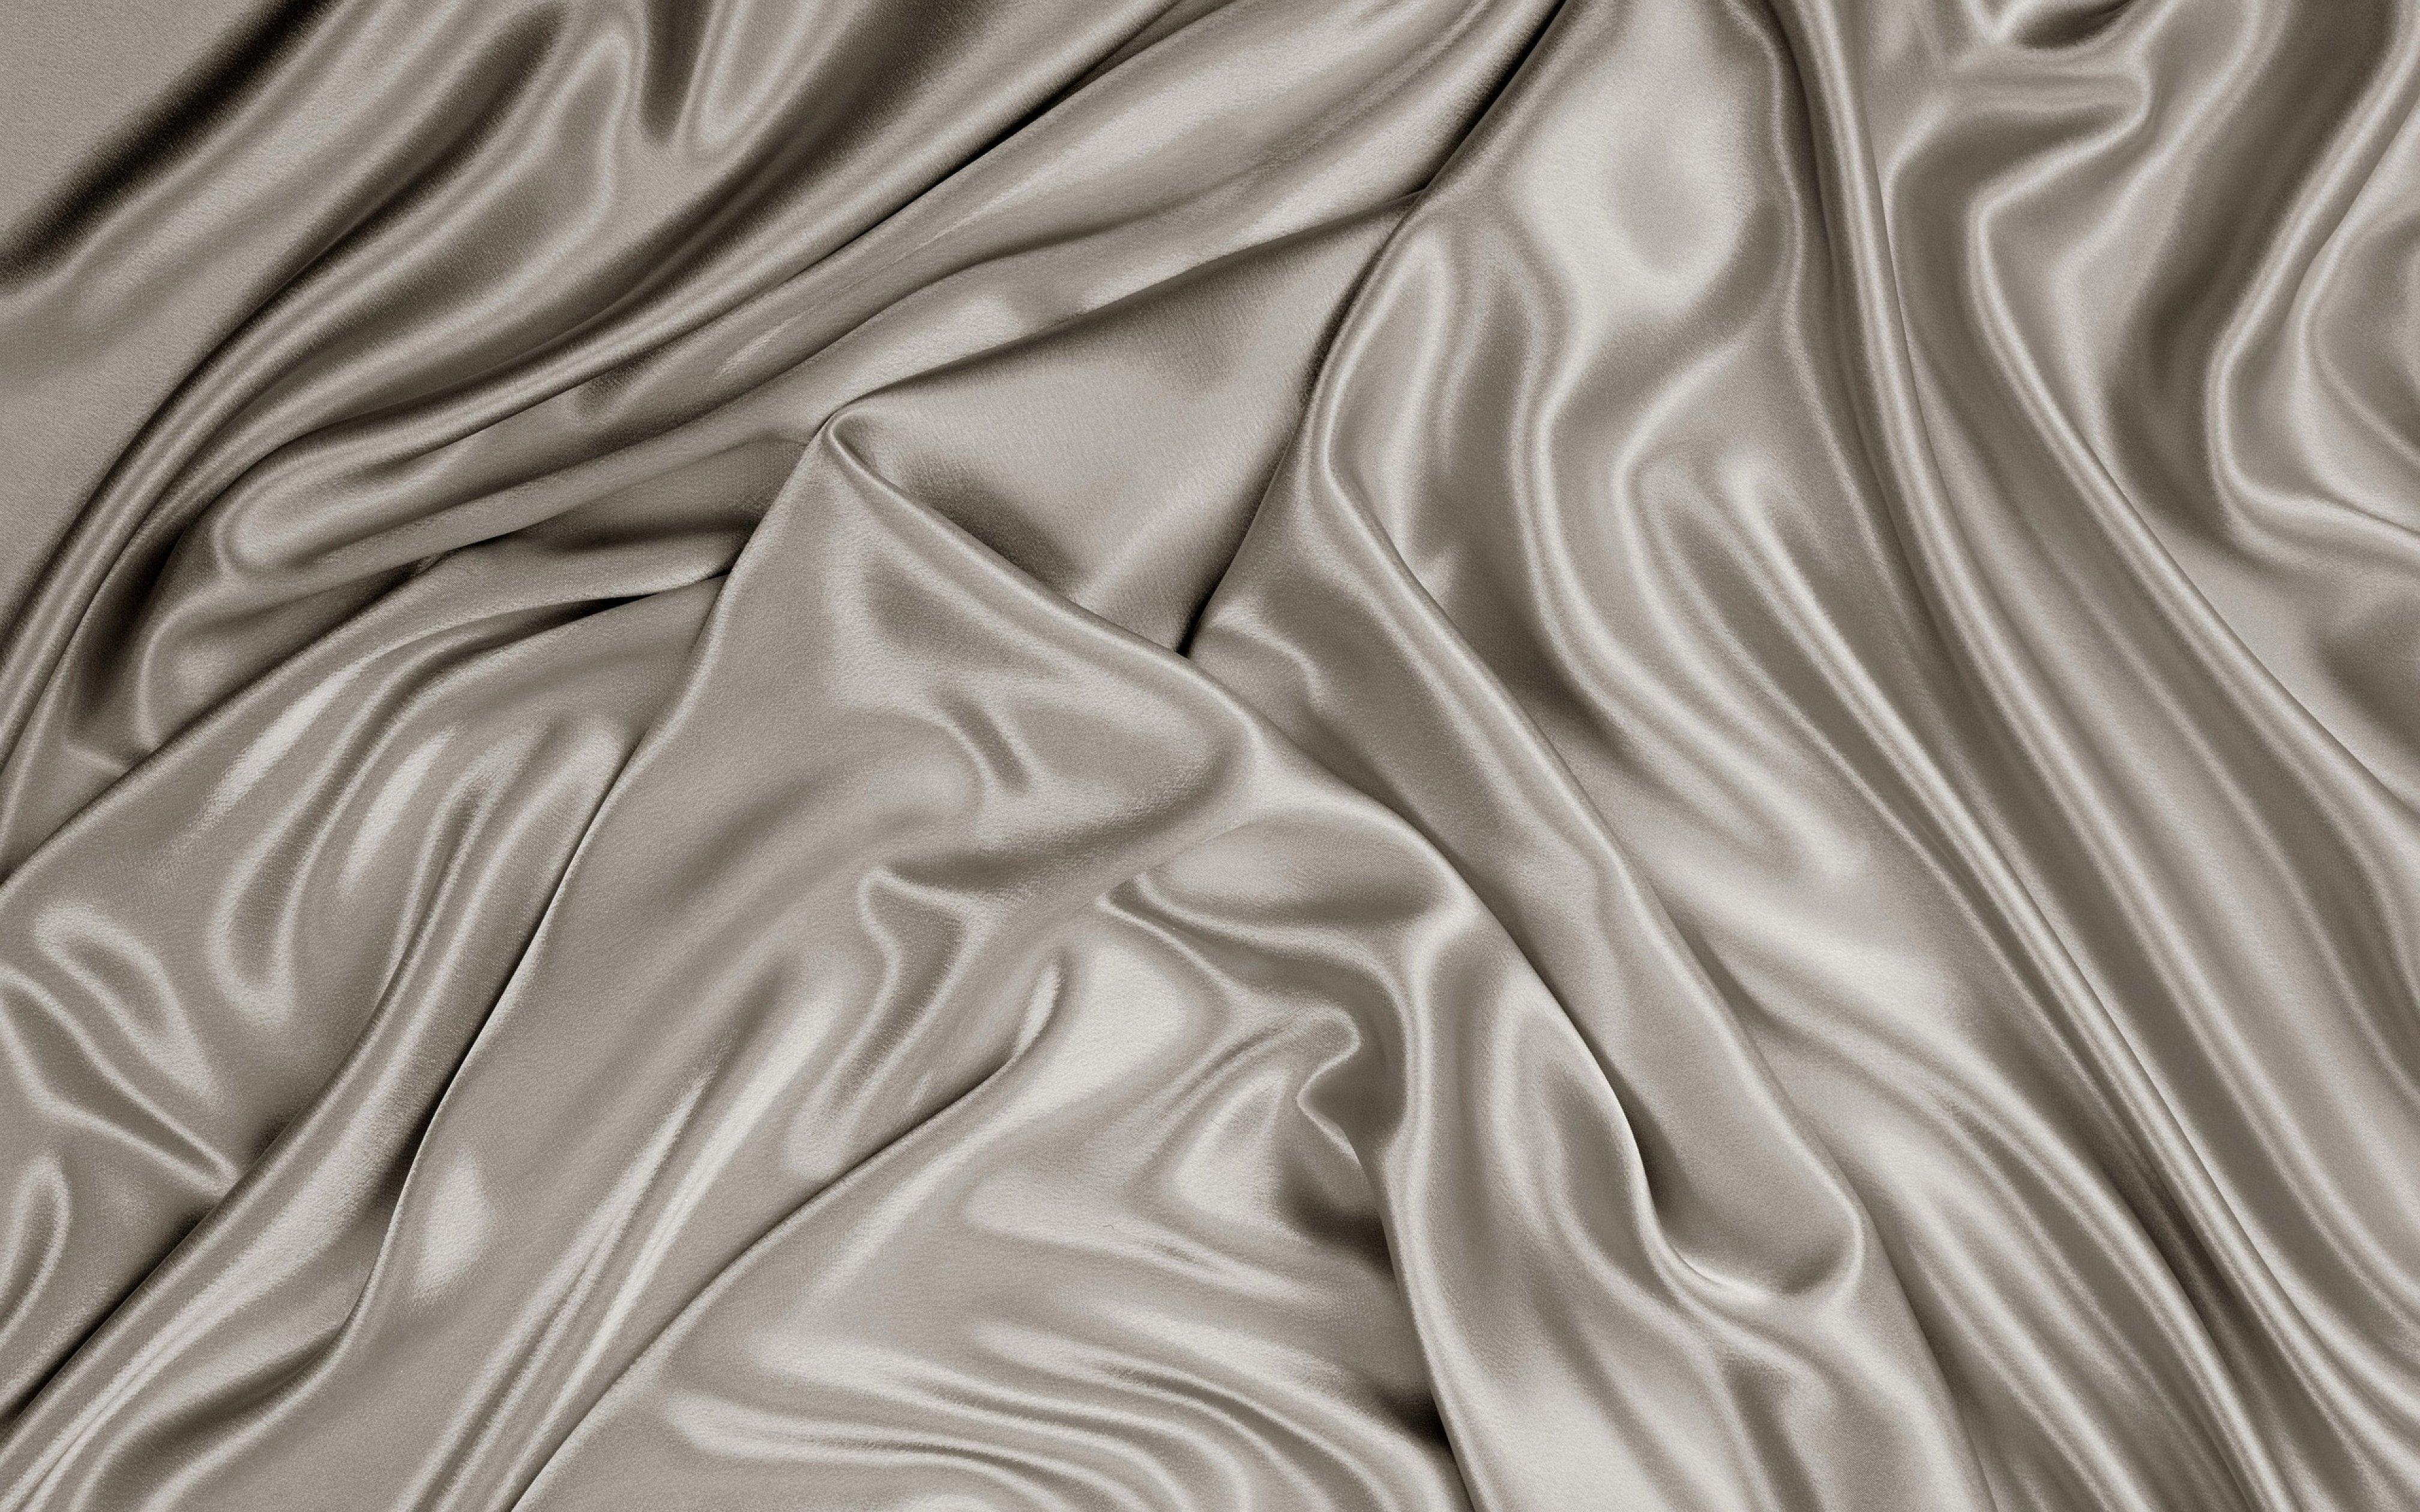 Ткань текстура шелк